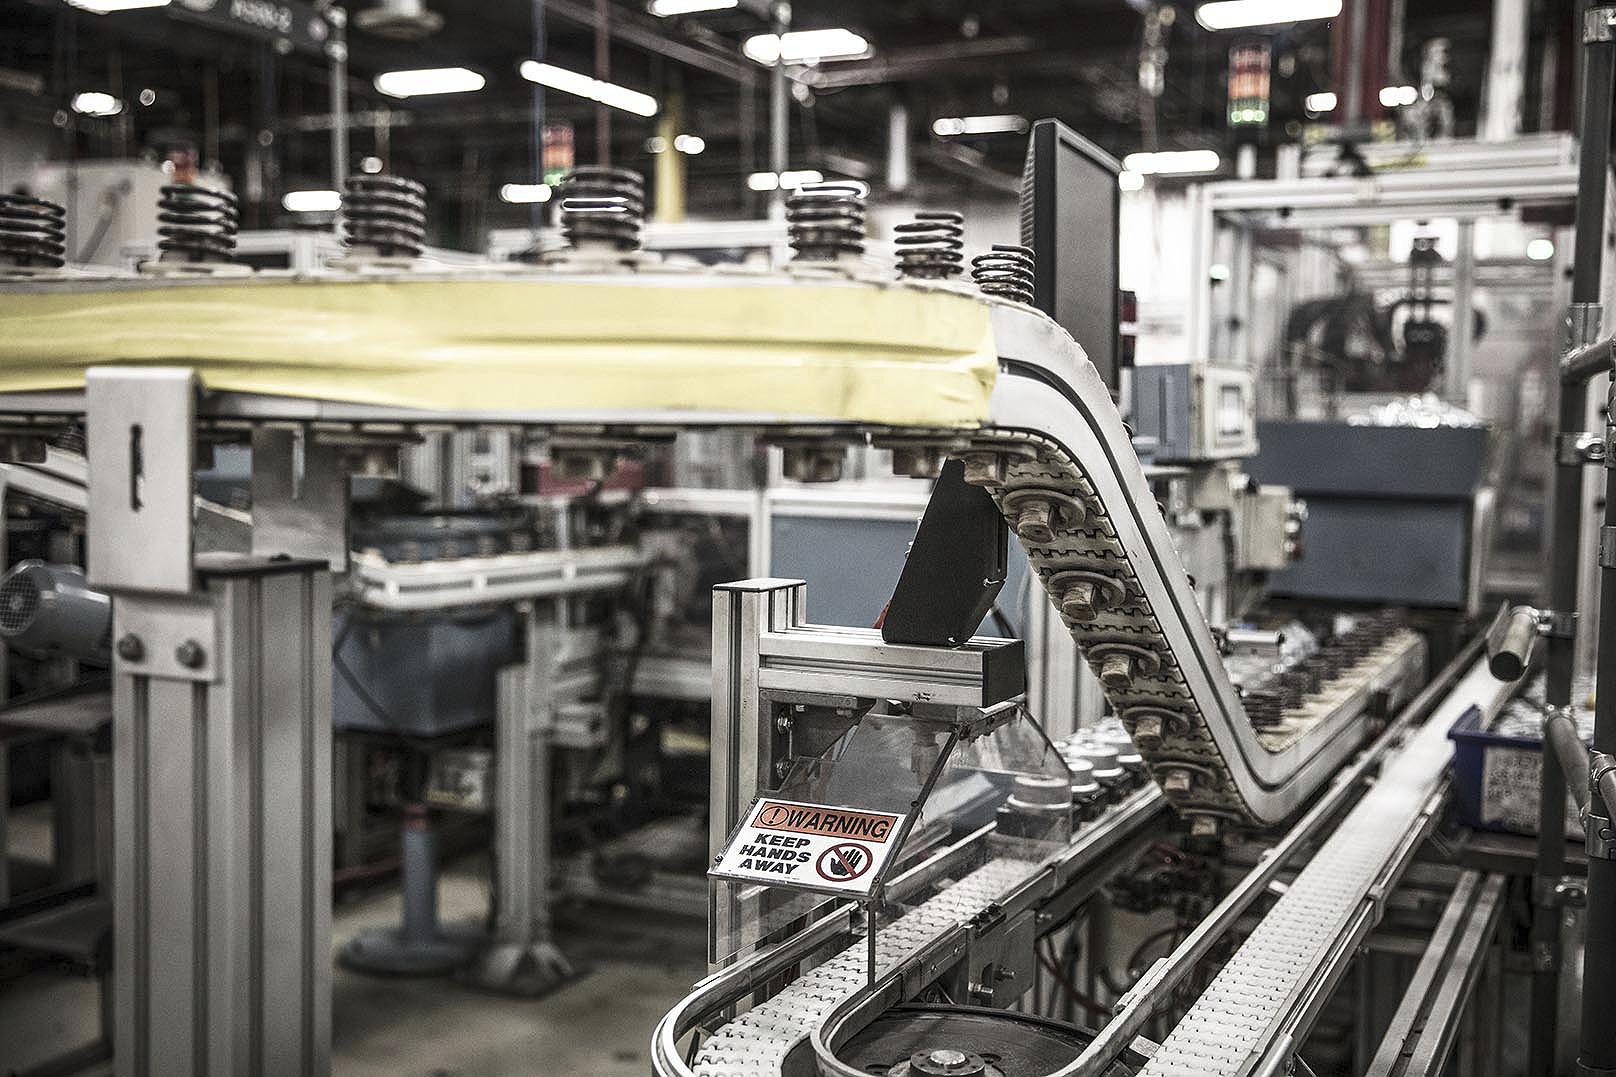 Manurfacturing conveyor system